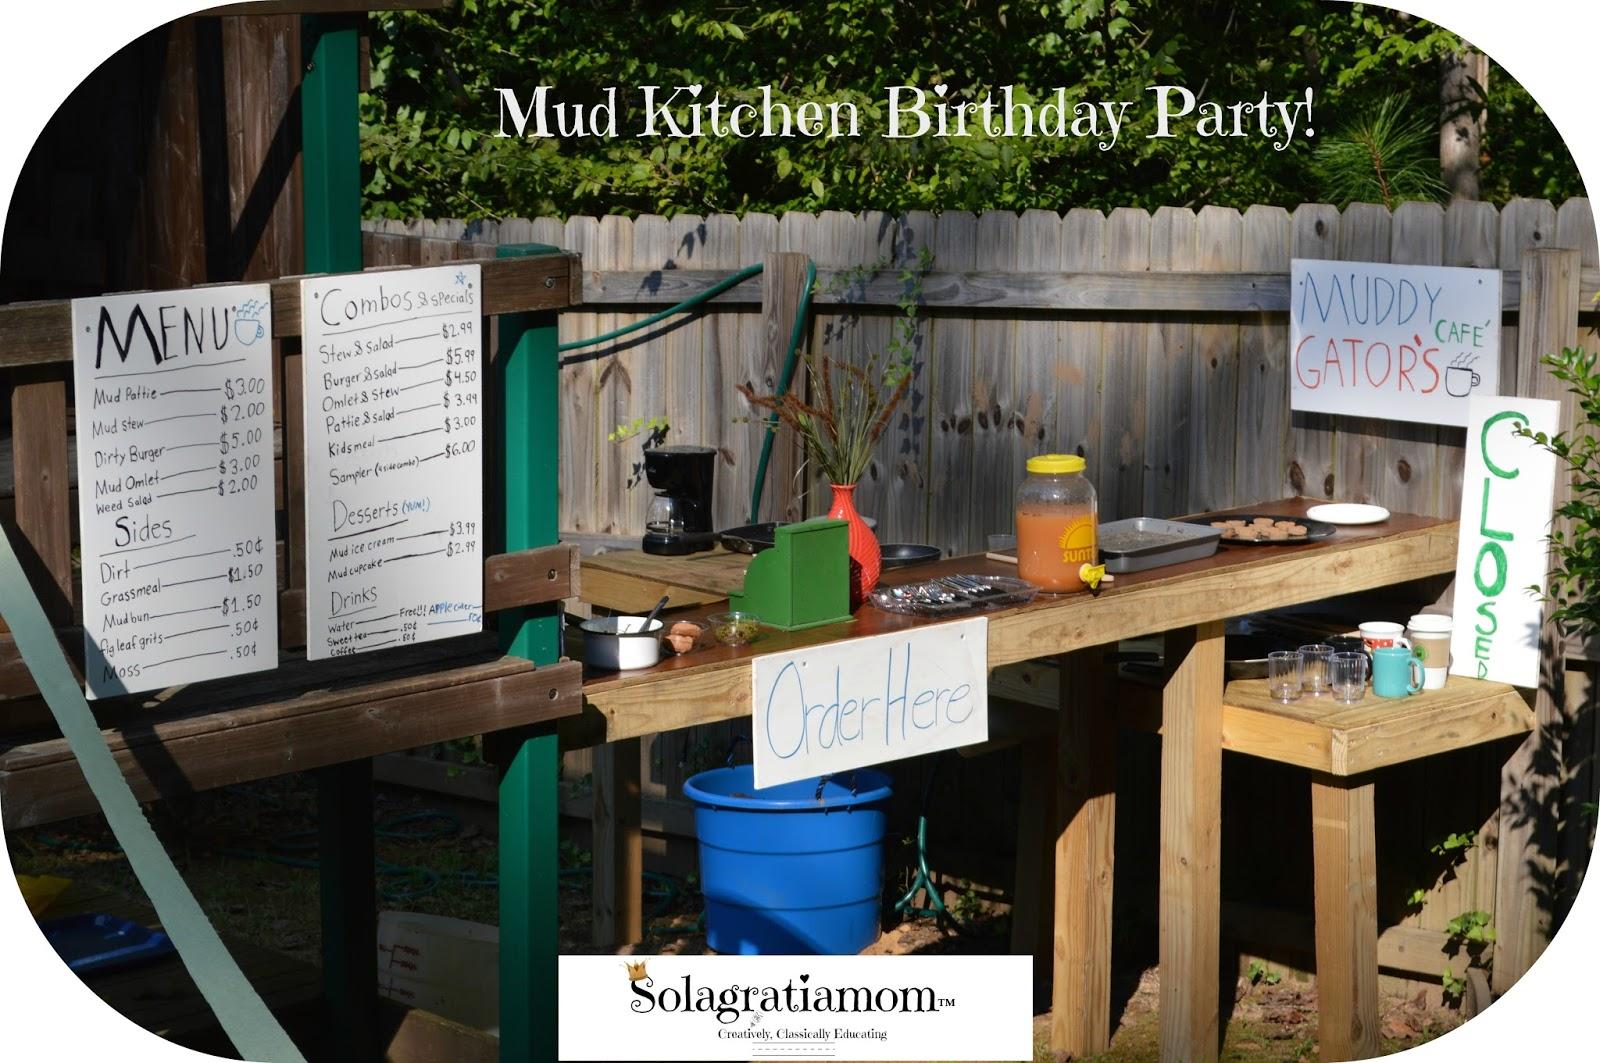 Mud Kitchen Birthday Party